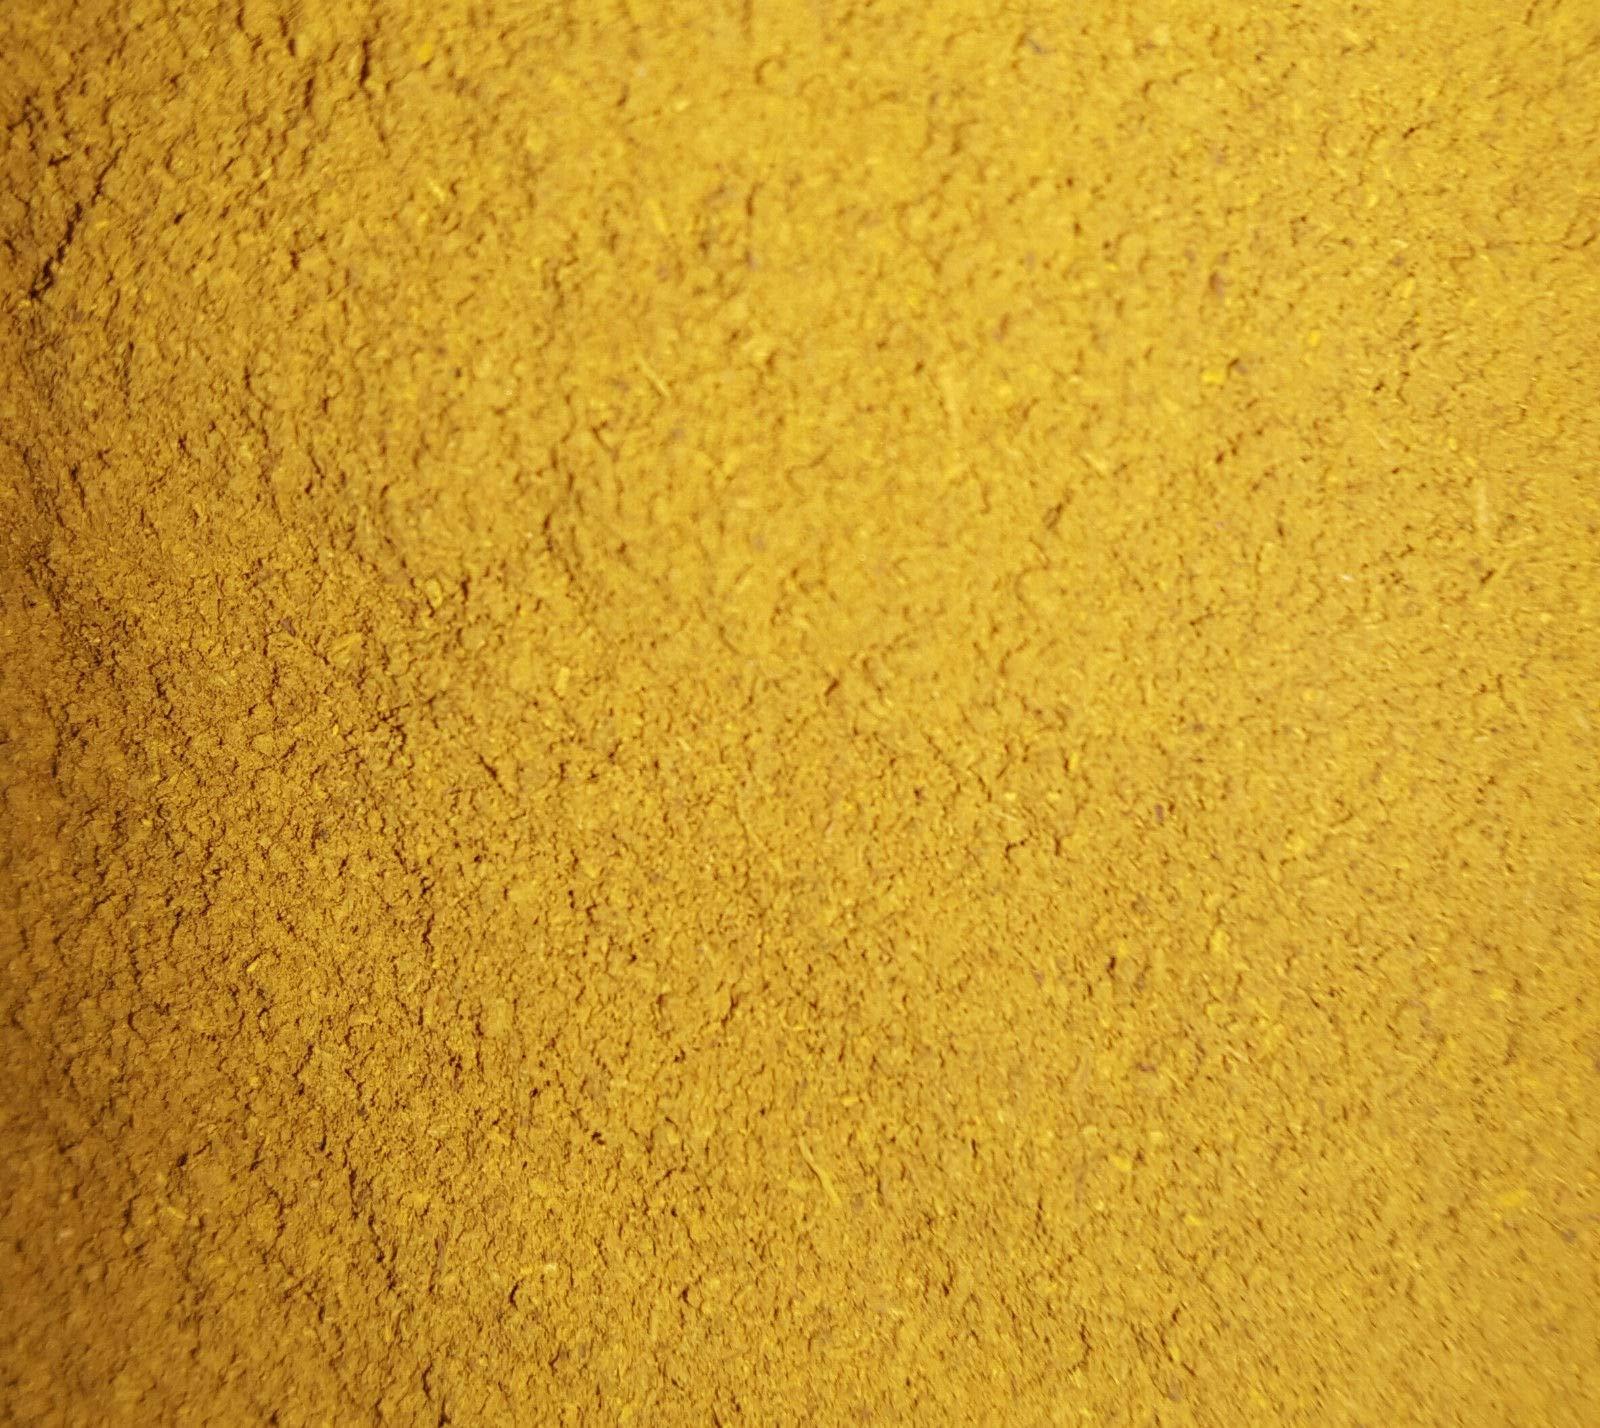 8oz Goldenseal Root Powder Organic and Wild Hydrastis Canadensis 1/2 Pound